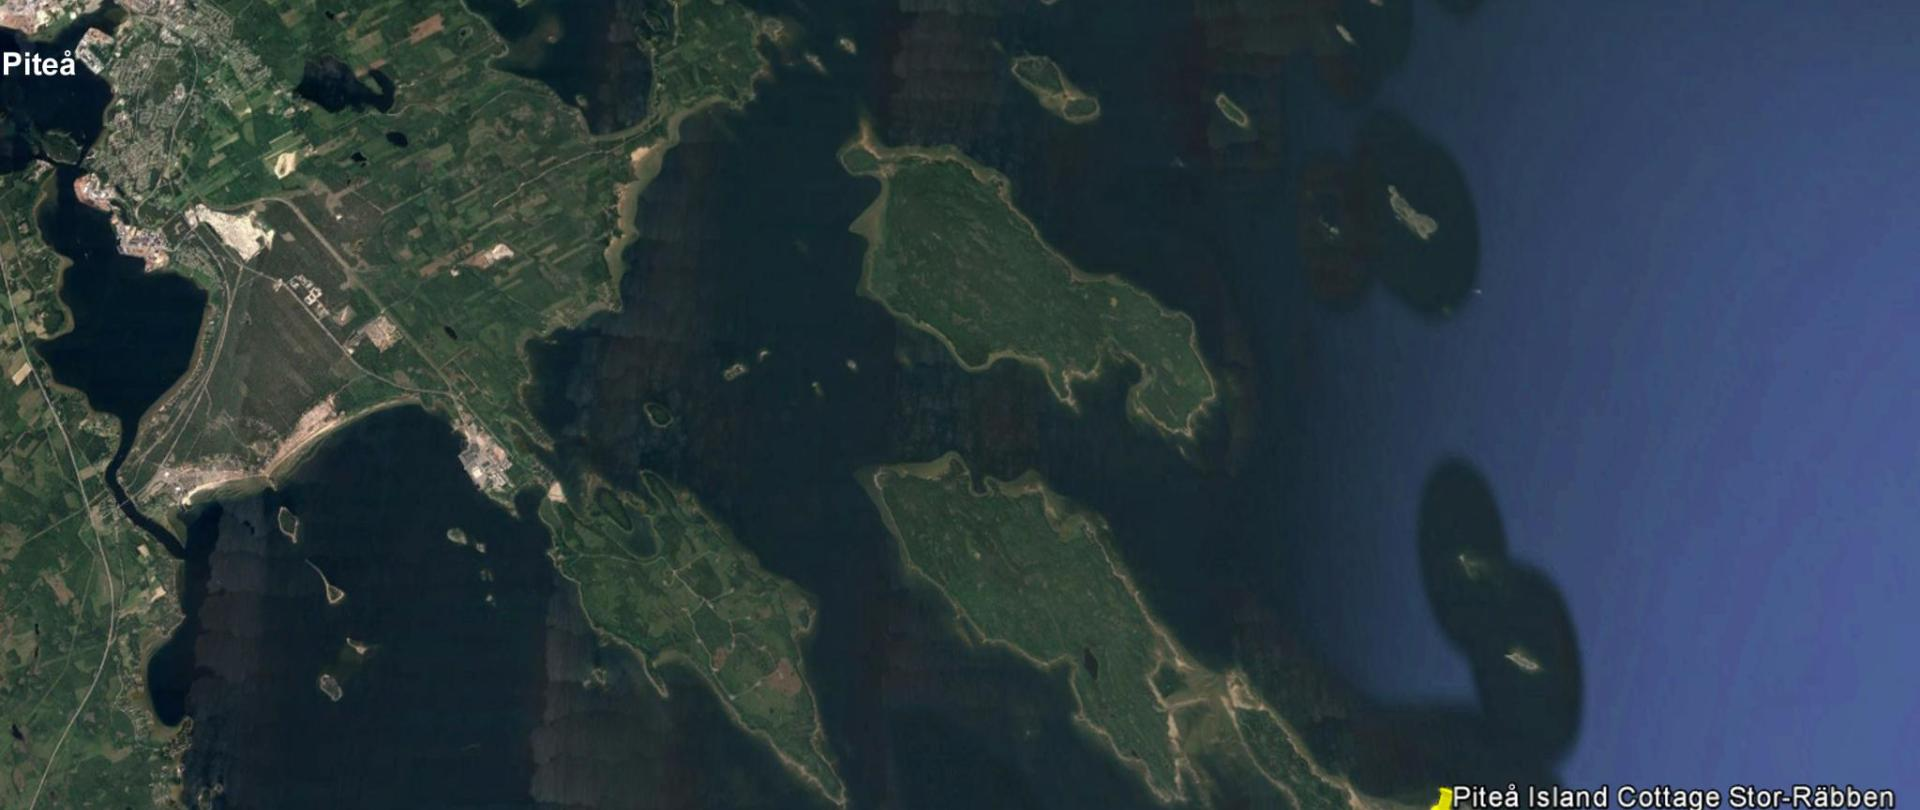 Piteå Island CottageStor-Räbben.jpg